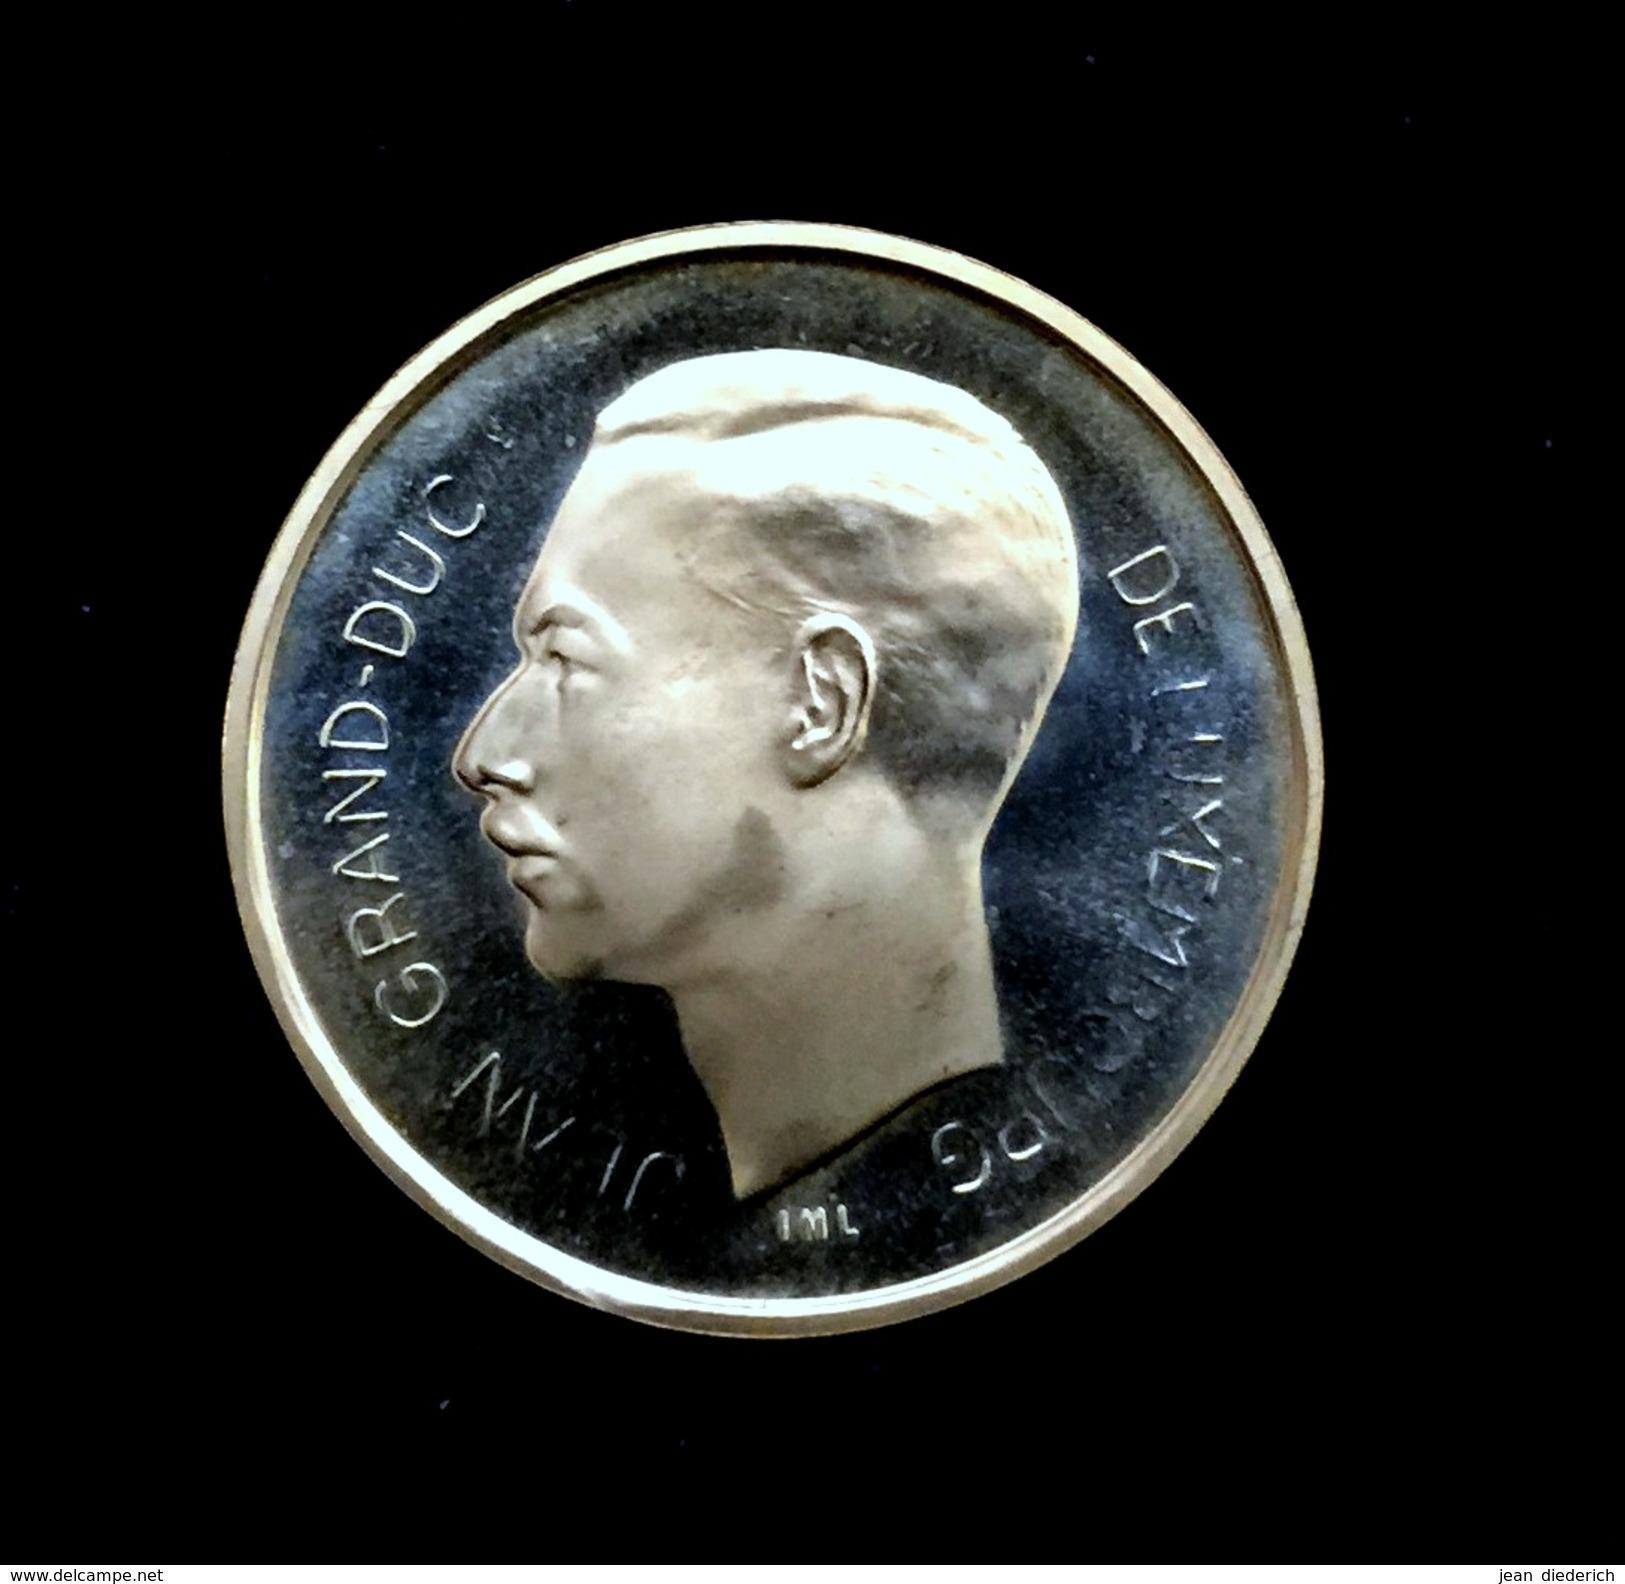 . Luxembourg (Luxemburg) - 500 Francs - 1944 Liberatioun 1994 - Luxembourg